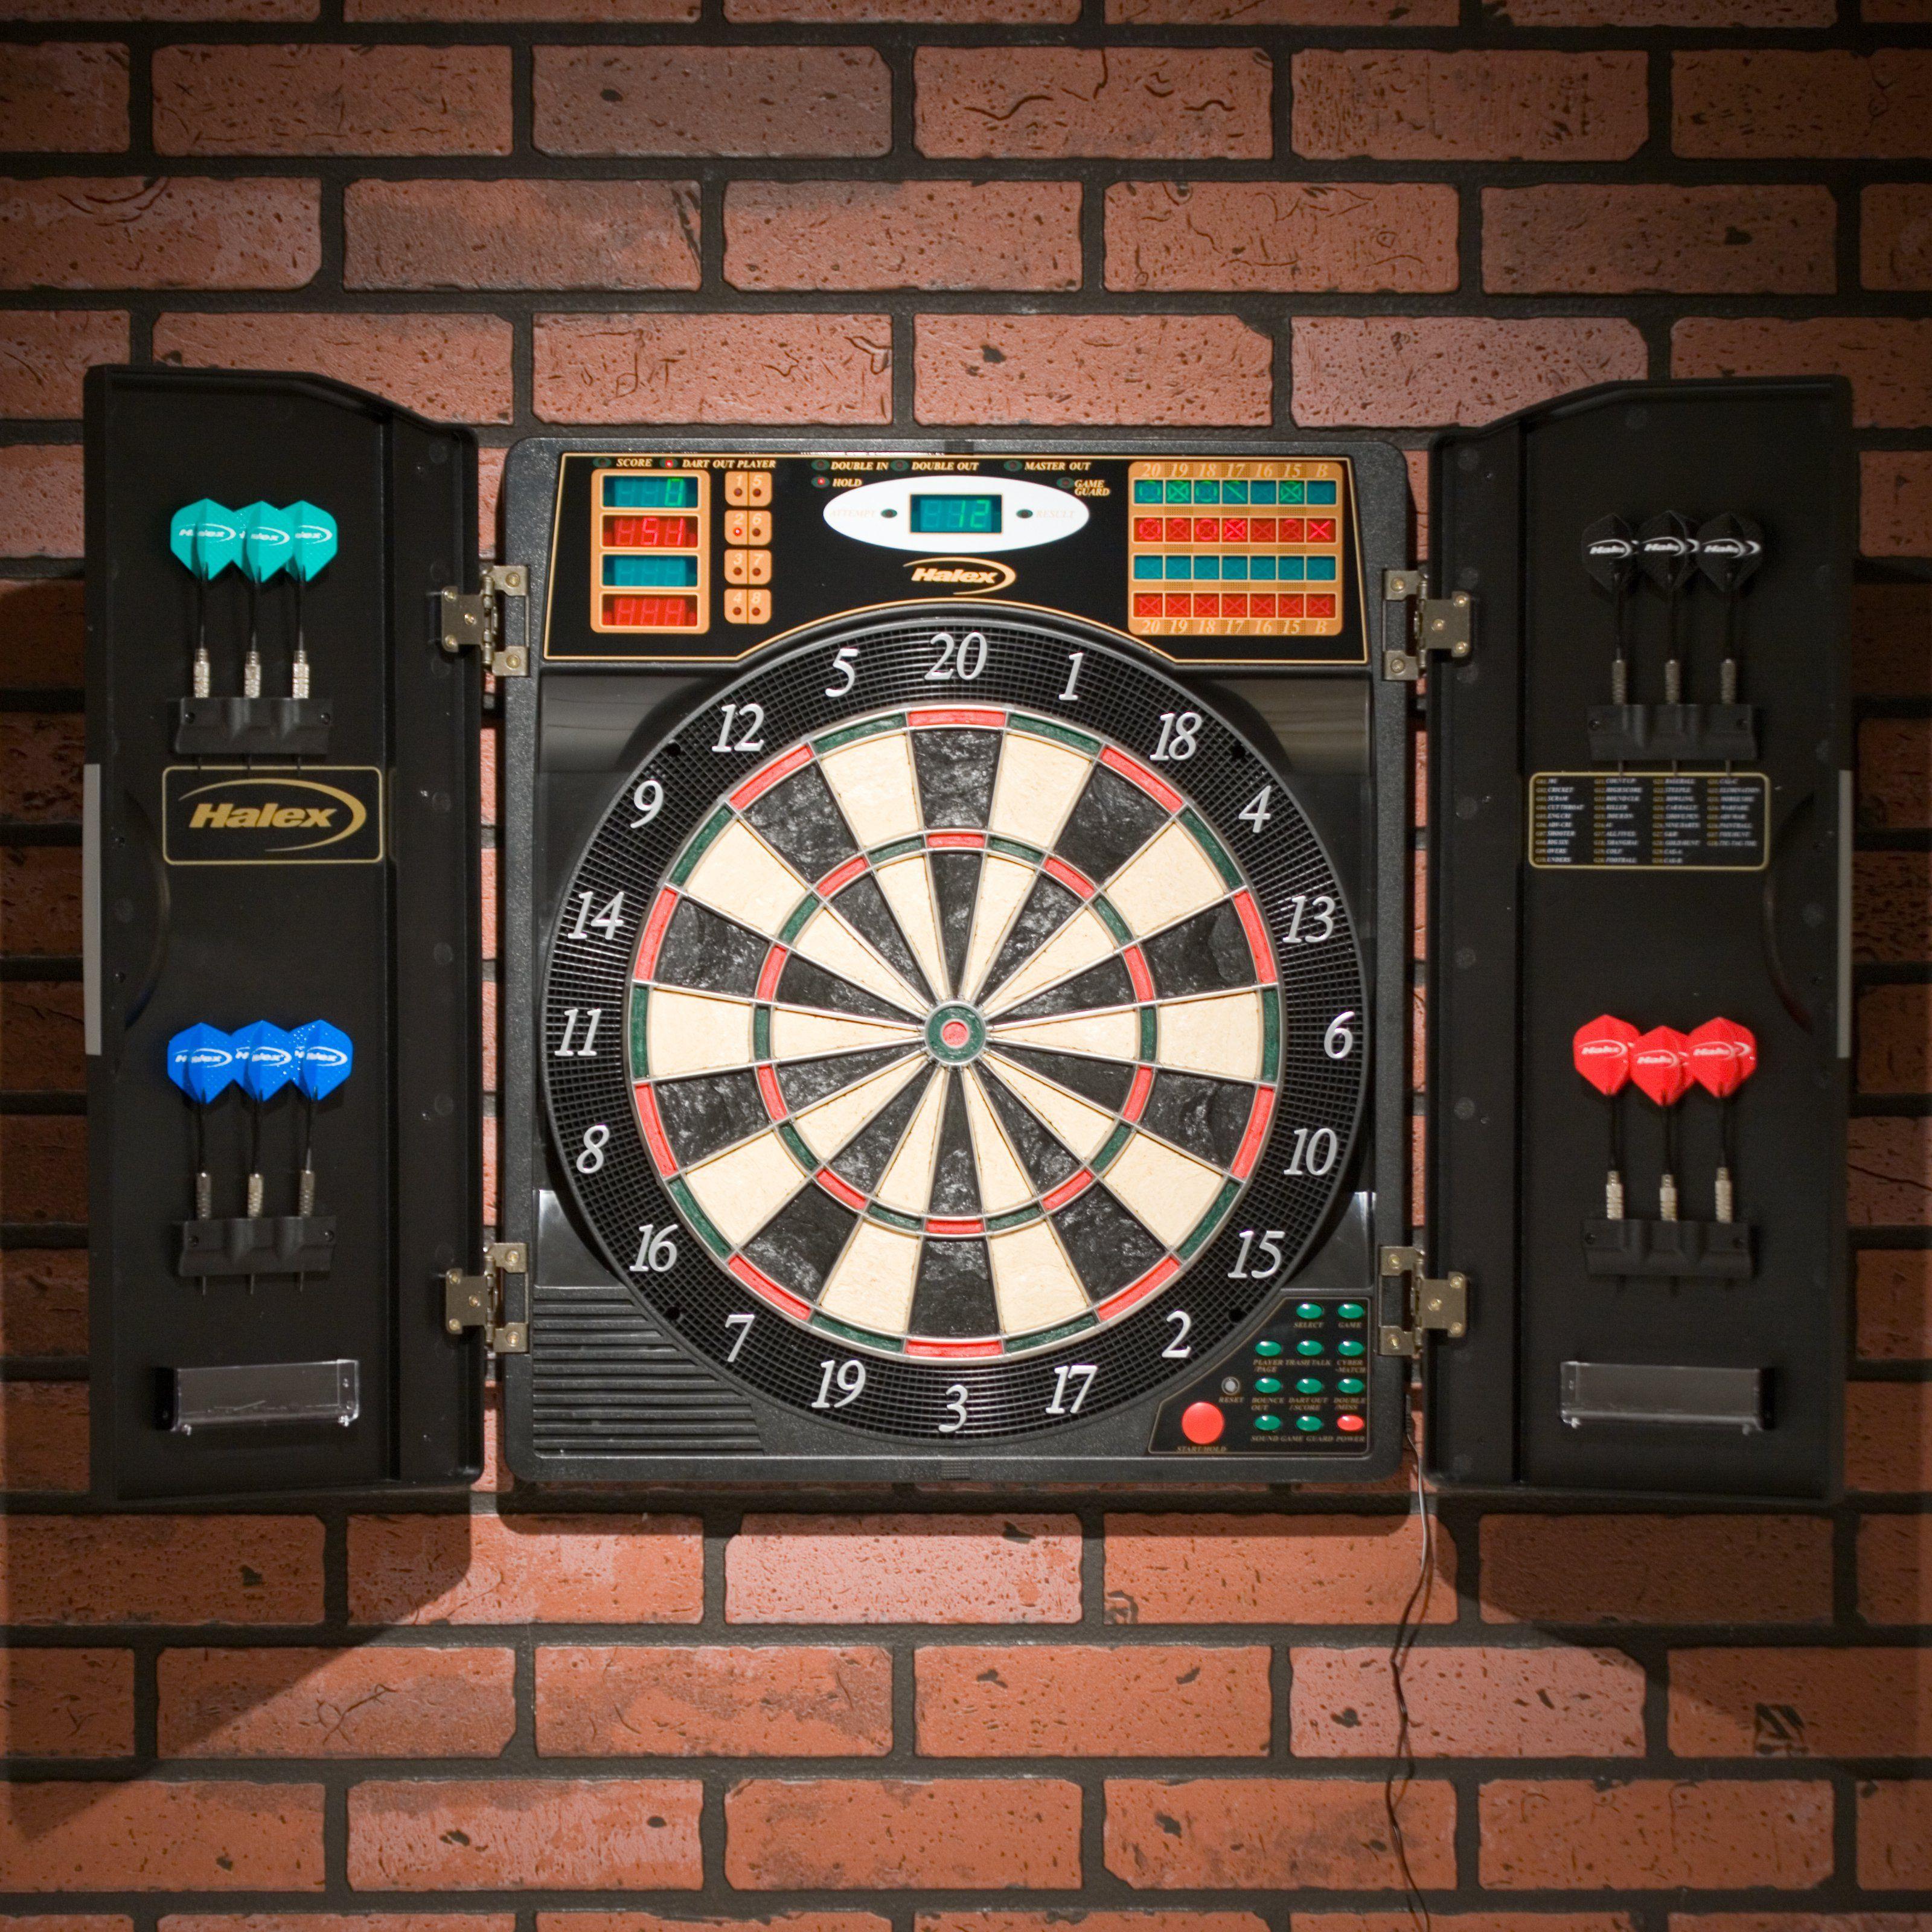 Have to have it. Halex Madison BristleTech Electronic Dart